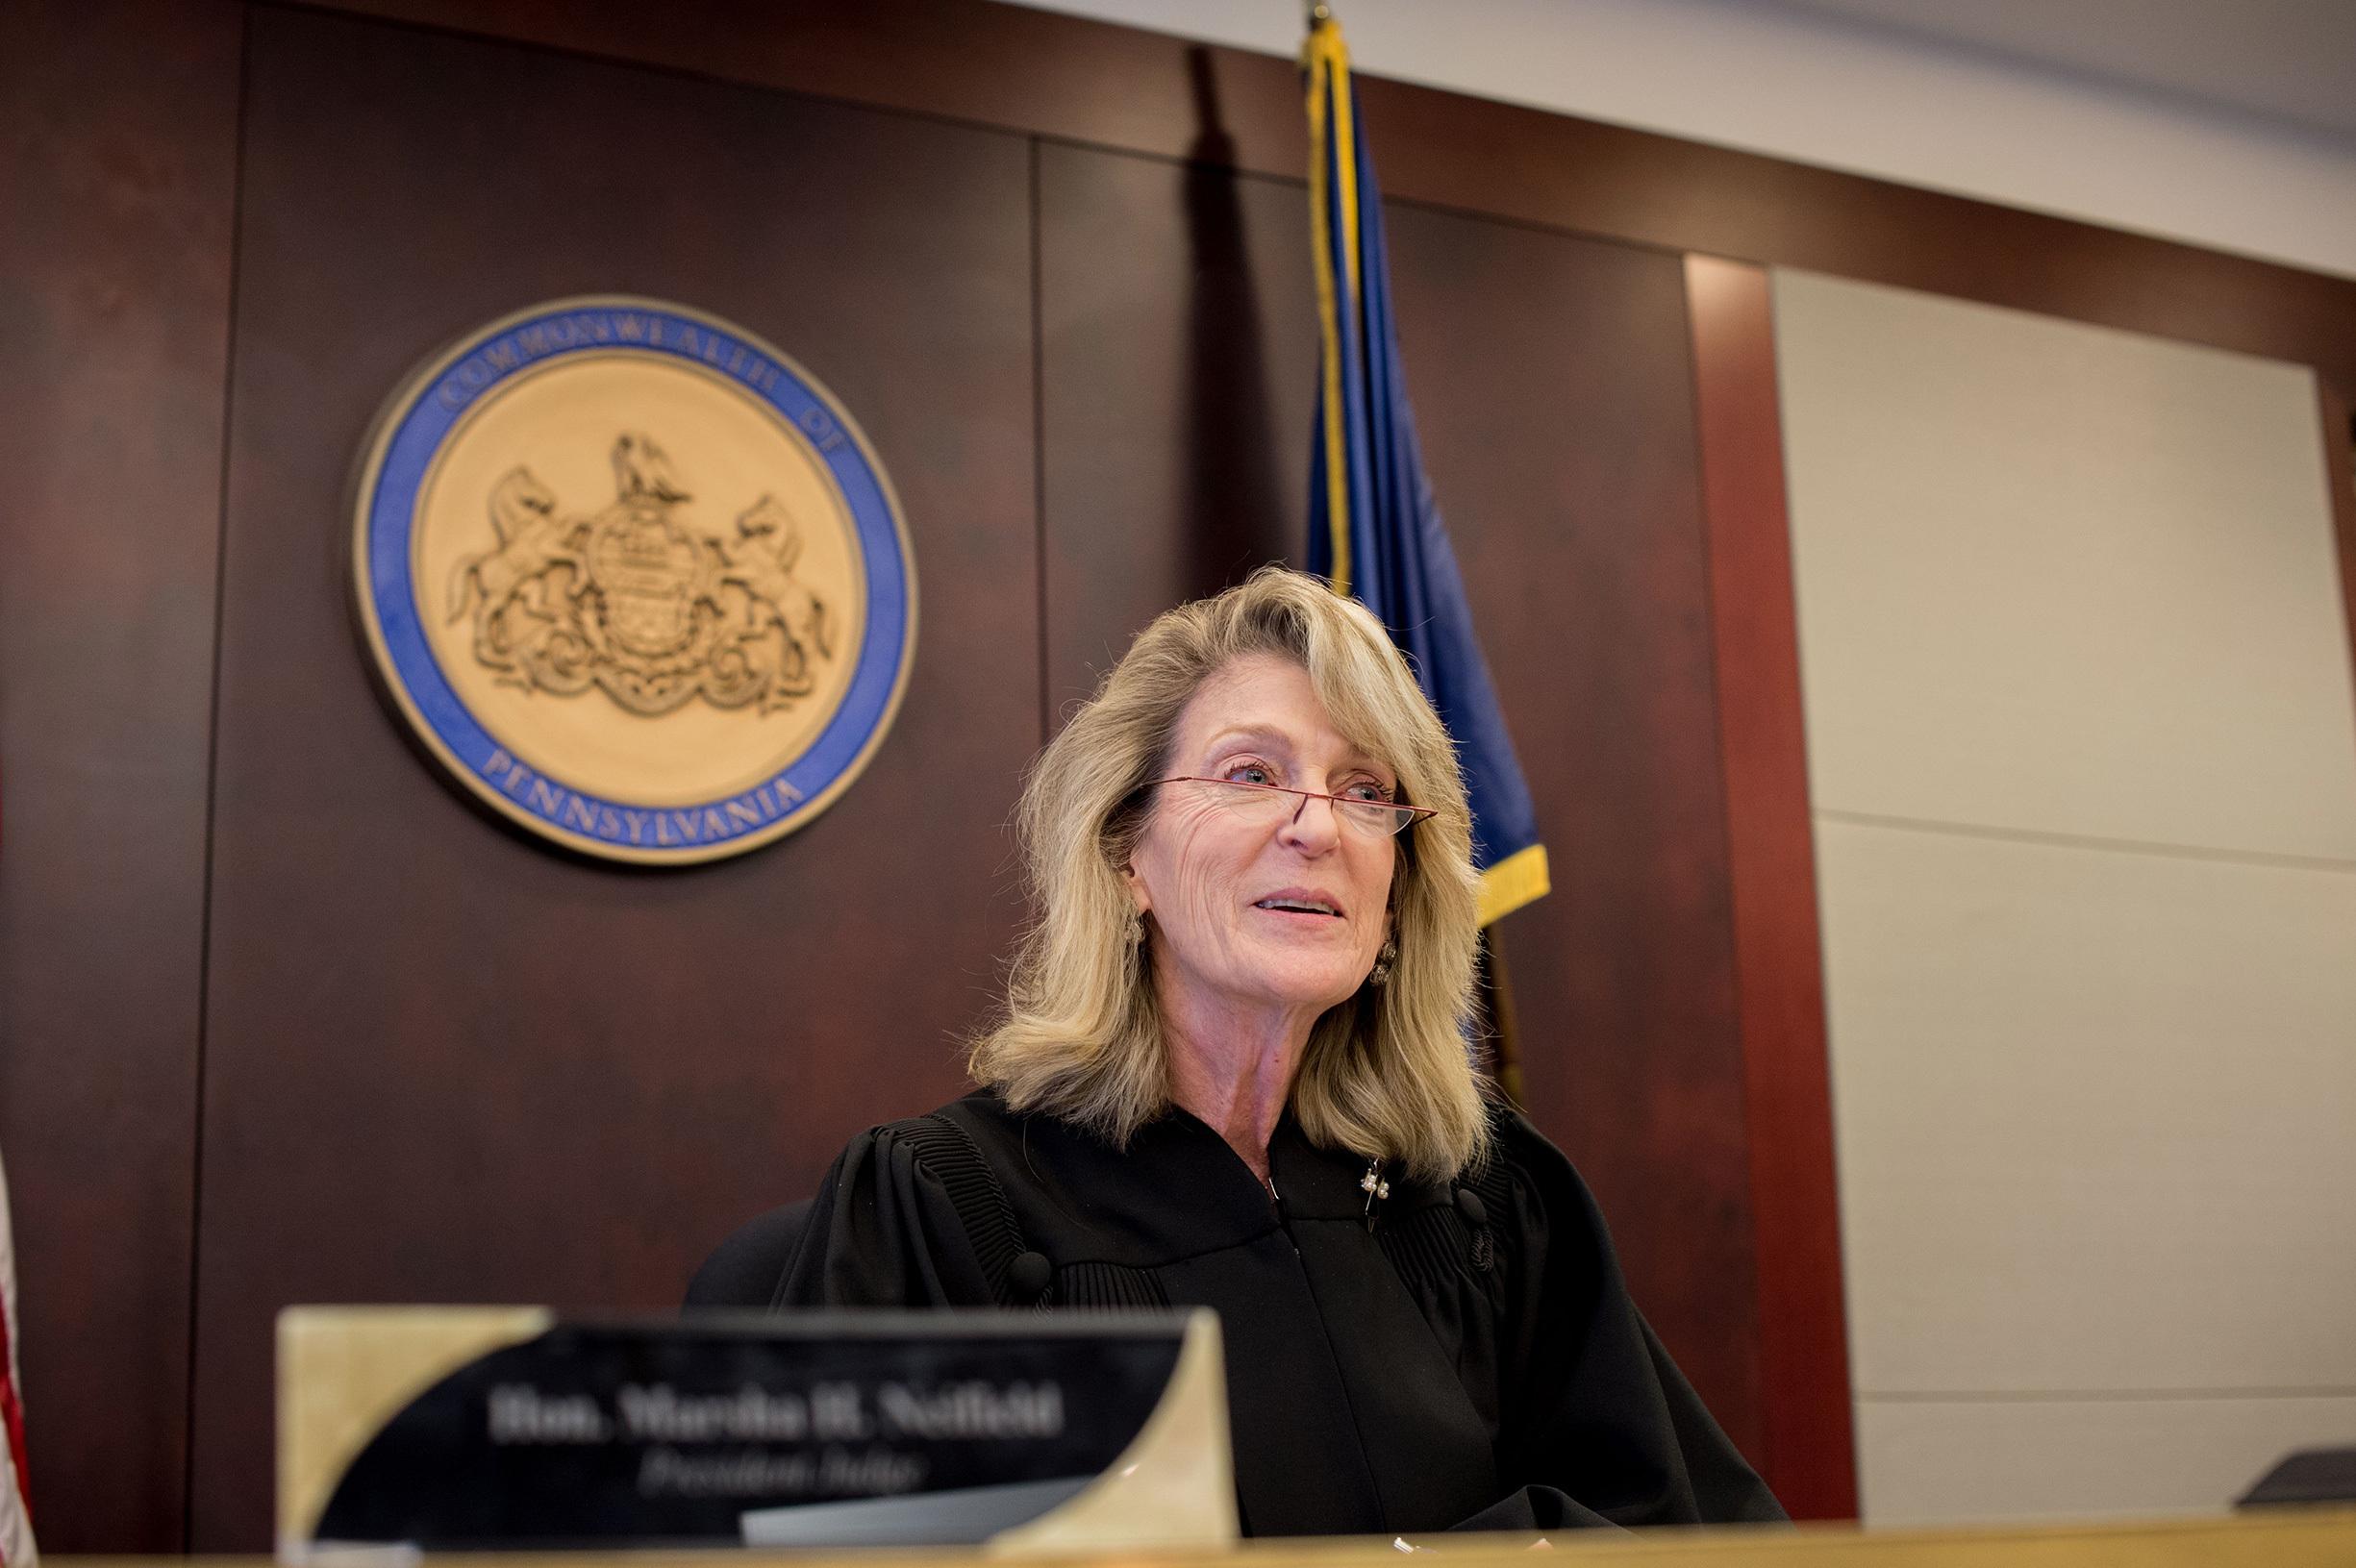 Human Toll Philadelphia Judge Neifield